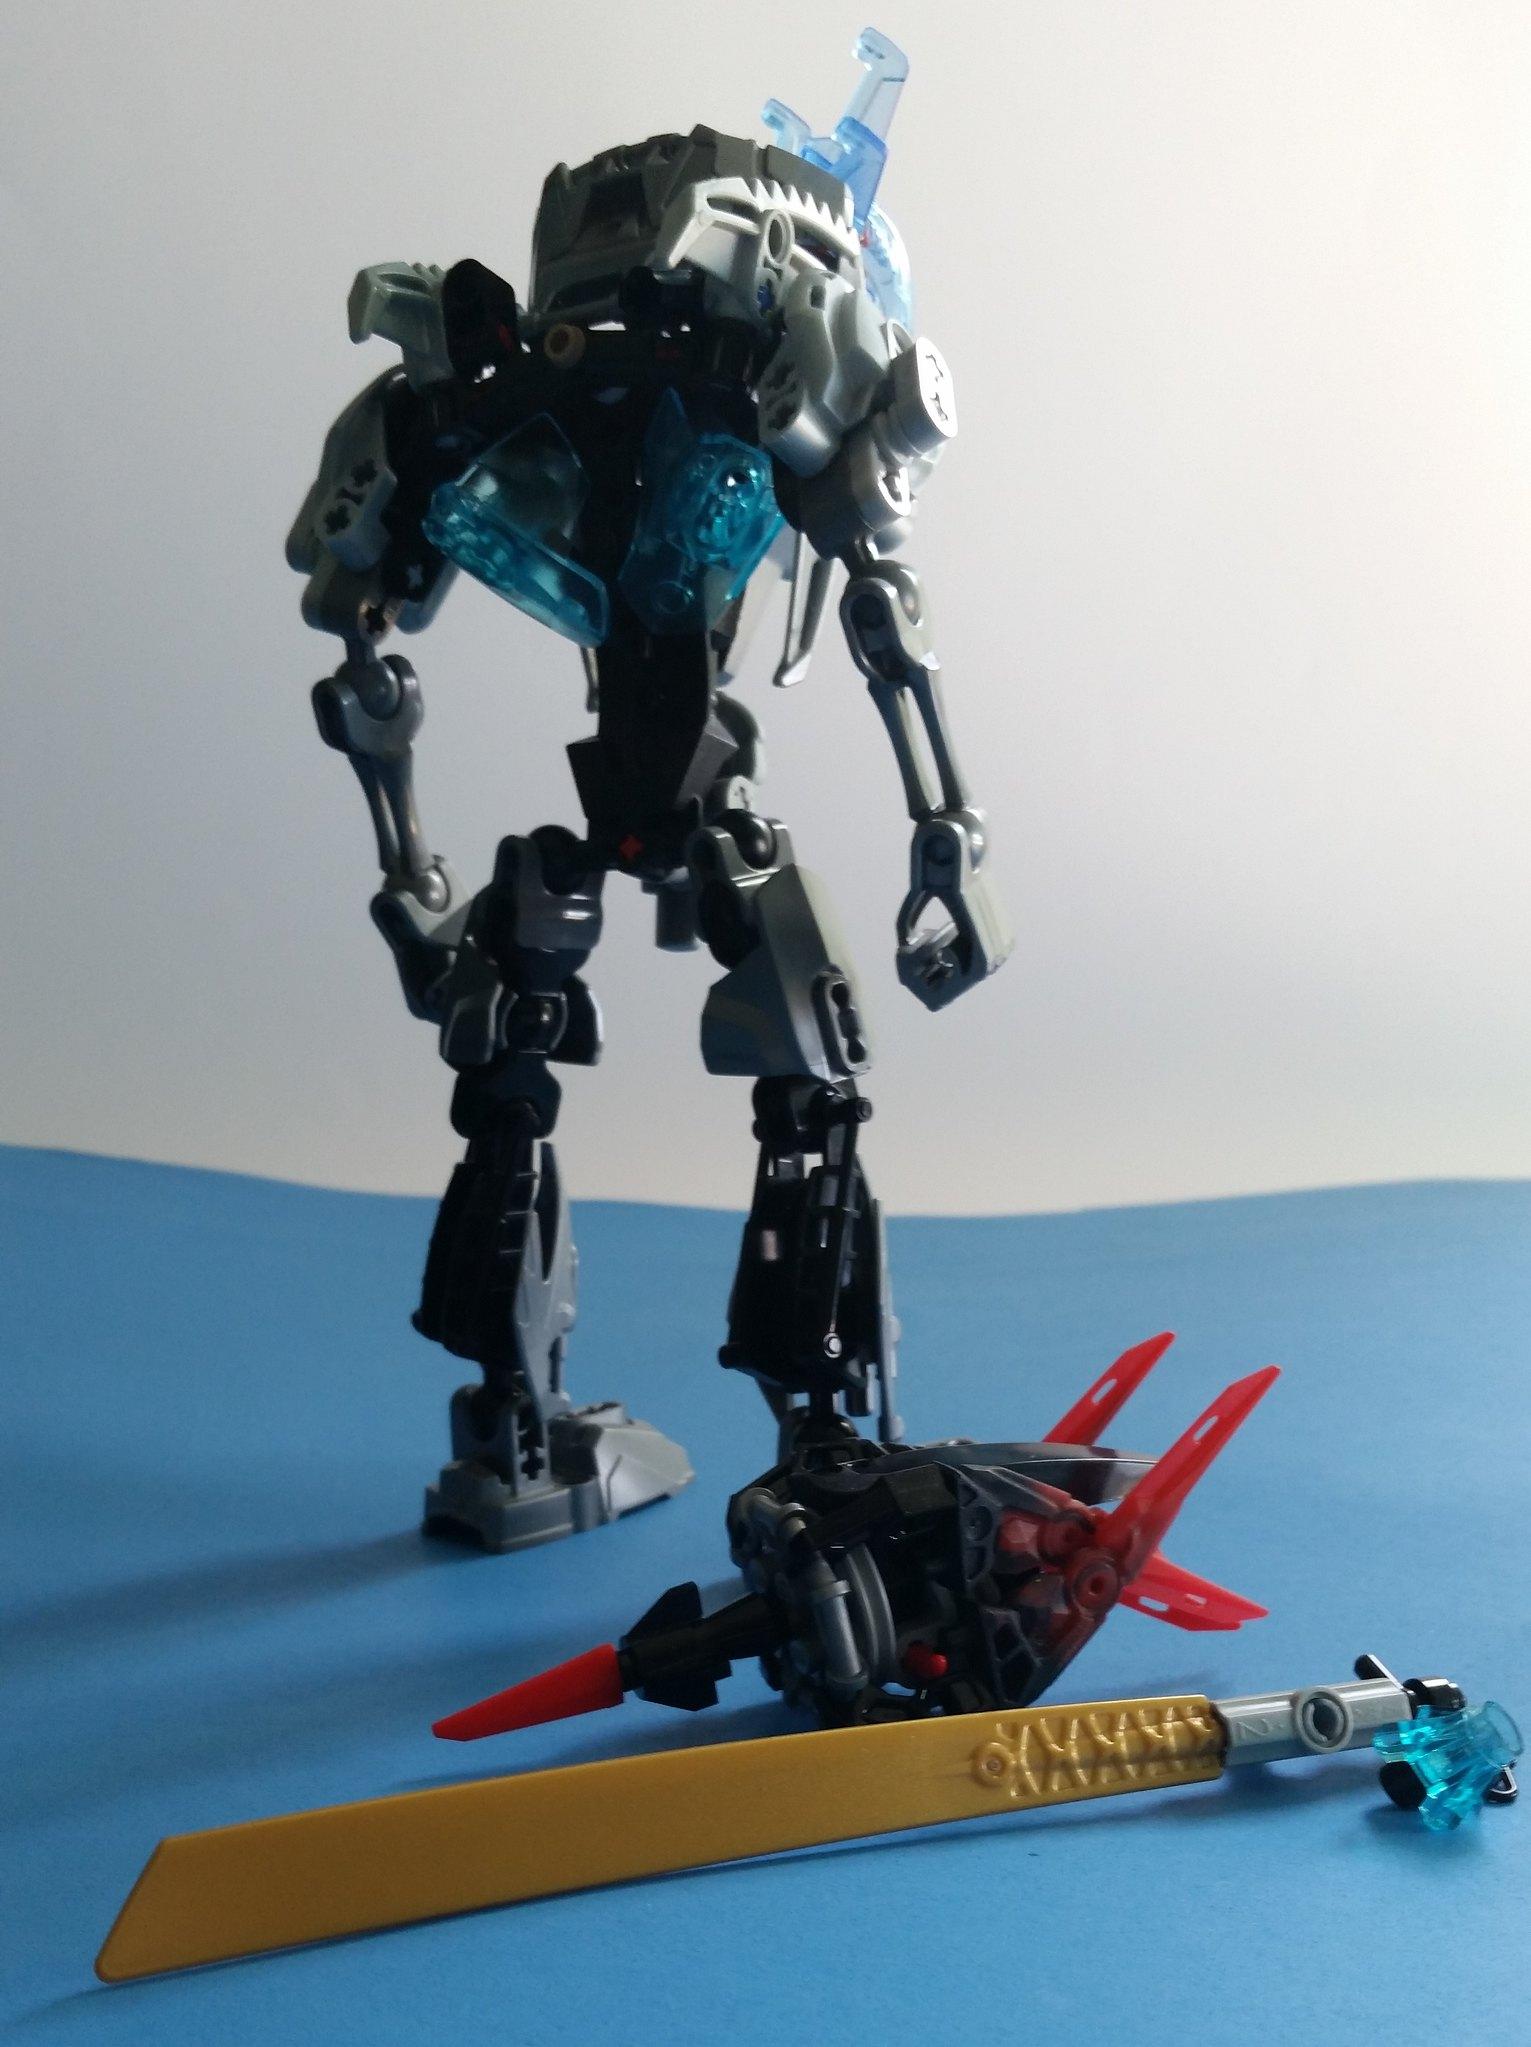 Halfire, The Metal Pursuit Weapons